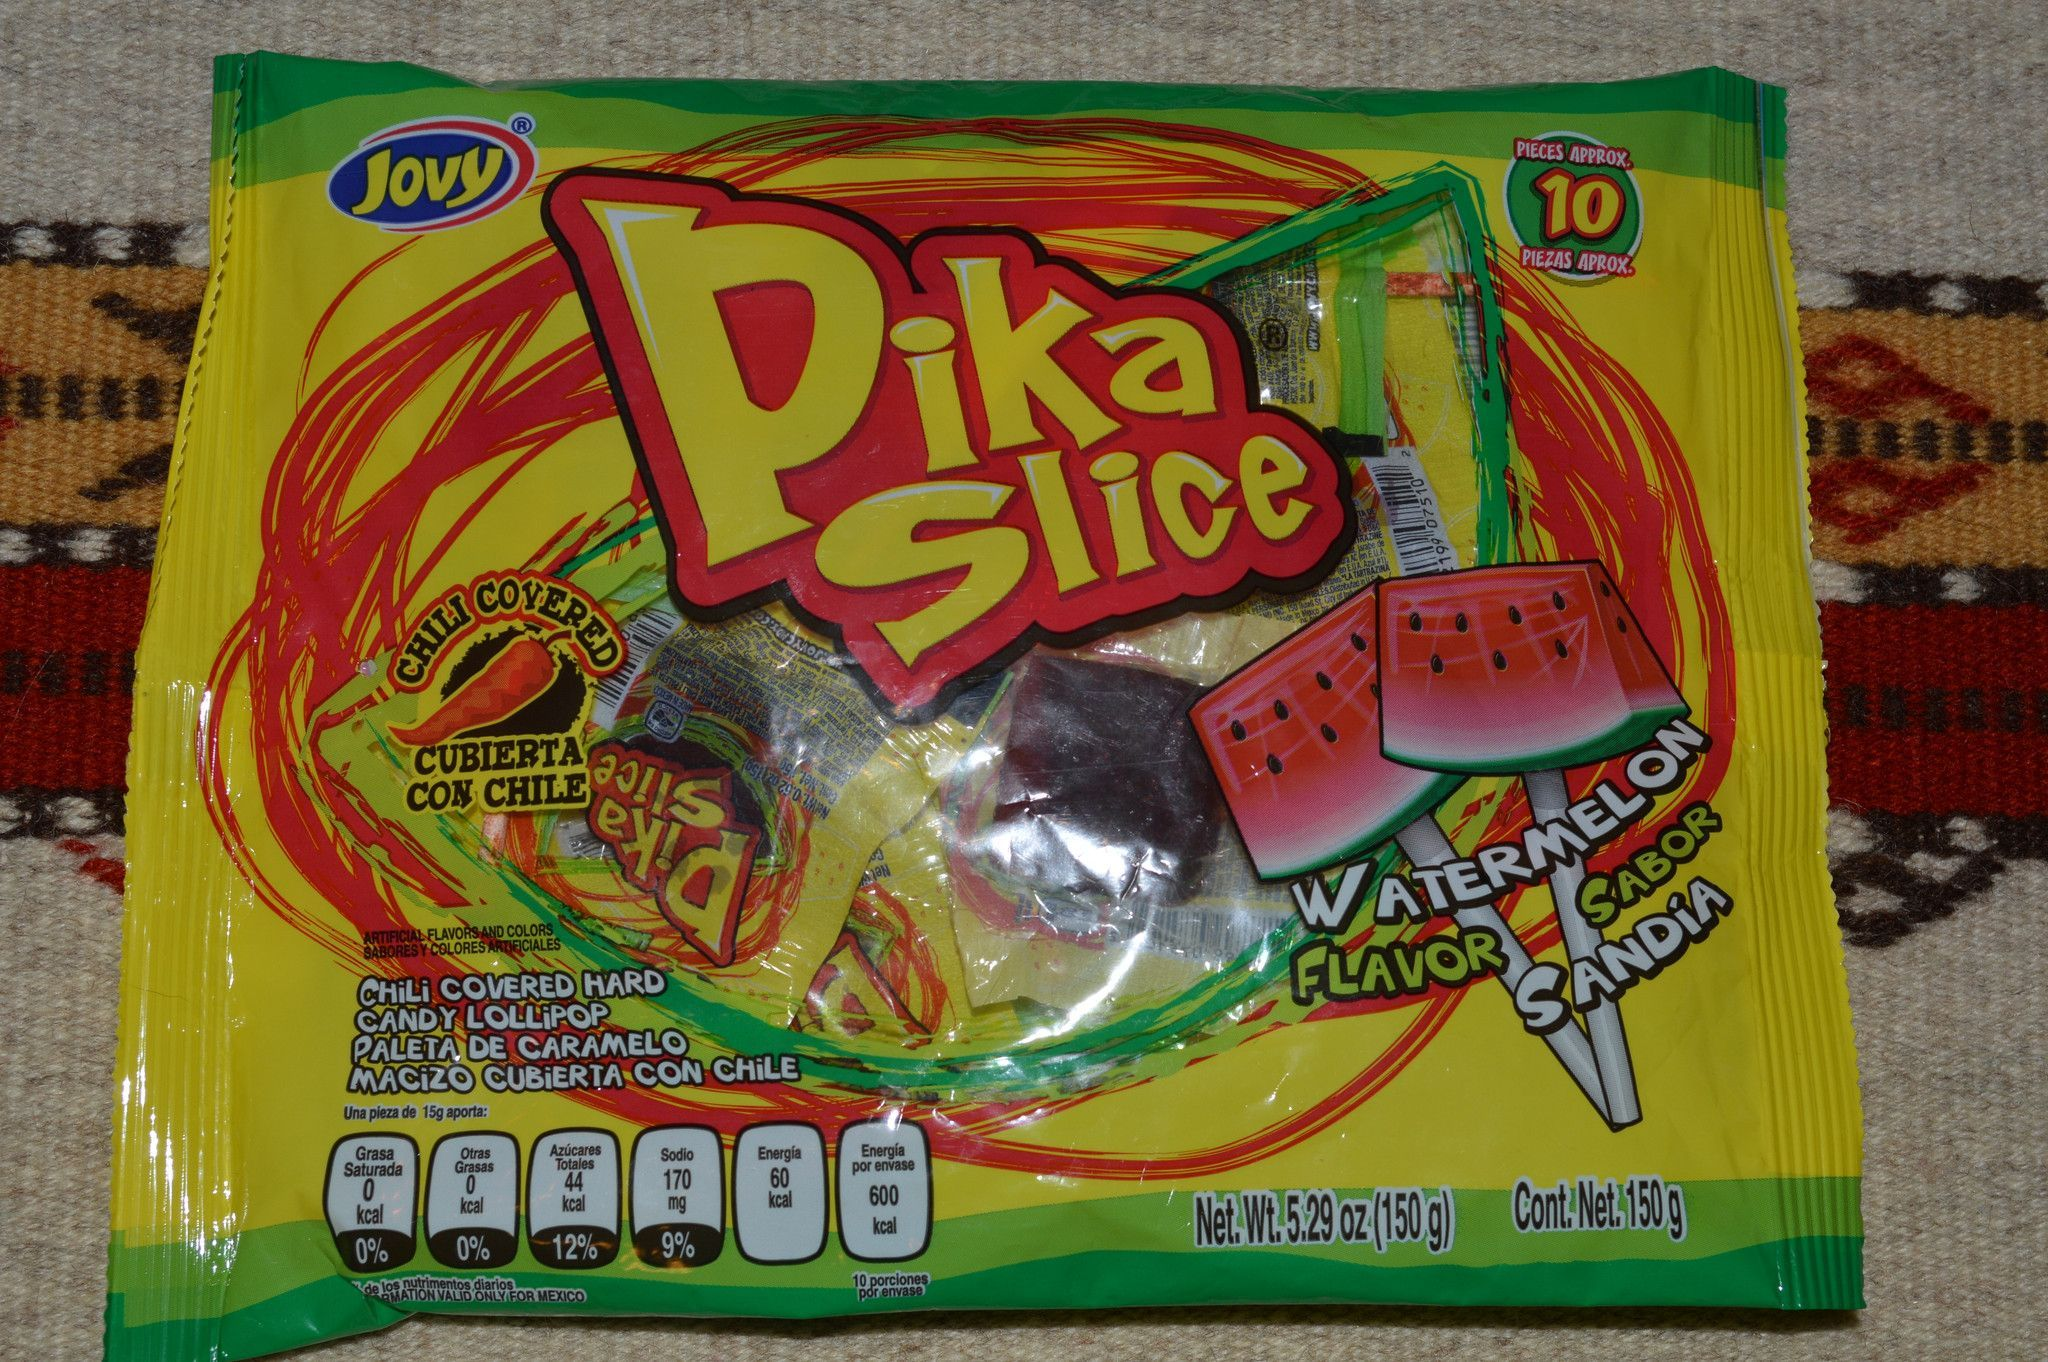 Jovy Pika Slice Sabor Sandia Chili Covered Mexican Watermelon Lollipops